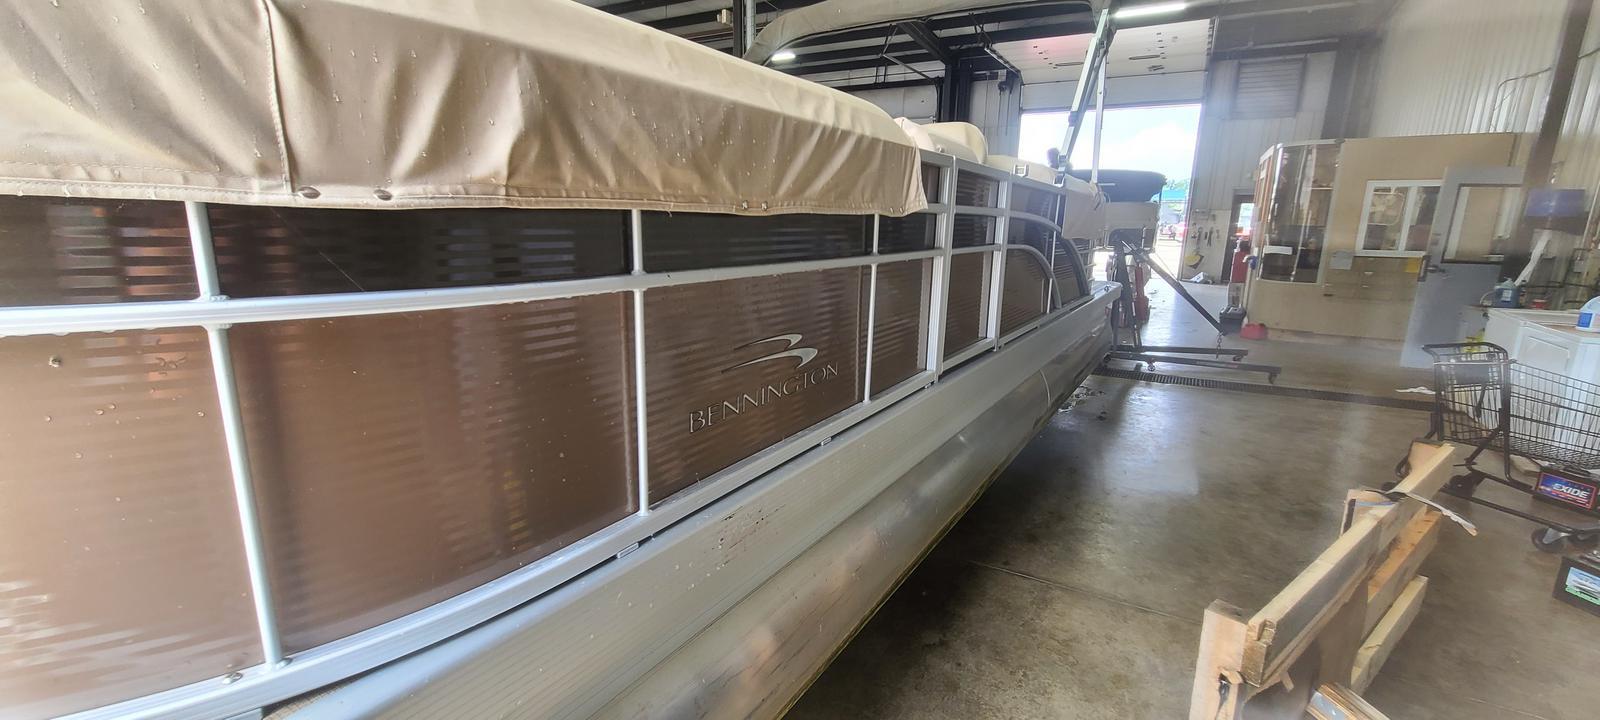 2018 Bennington boat for sale, model of the boat is 22 GSR & Image # 2 of 9